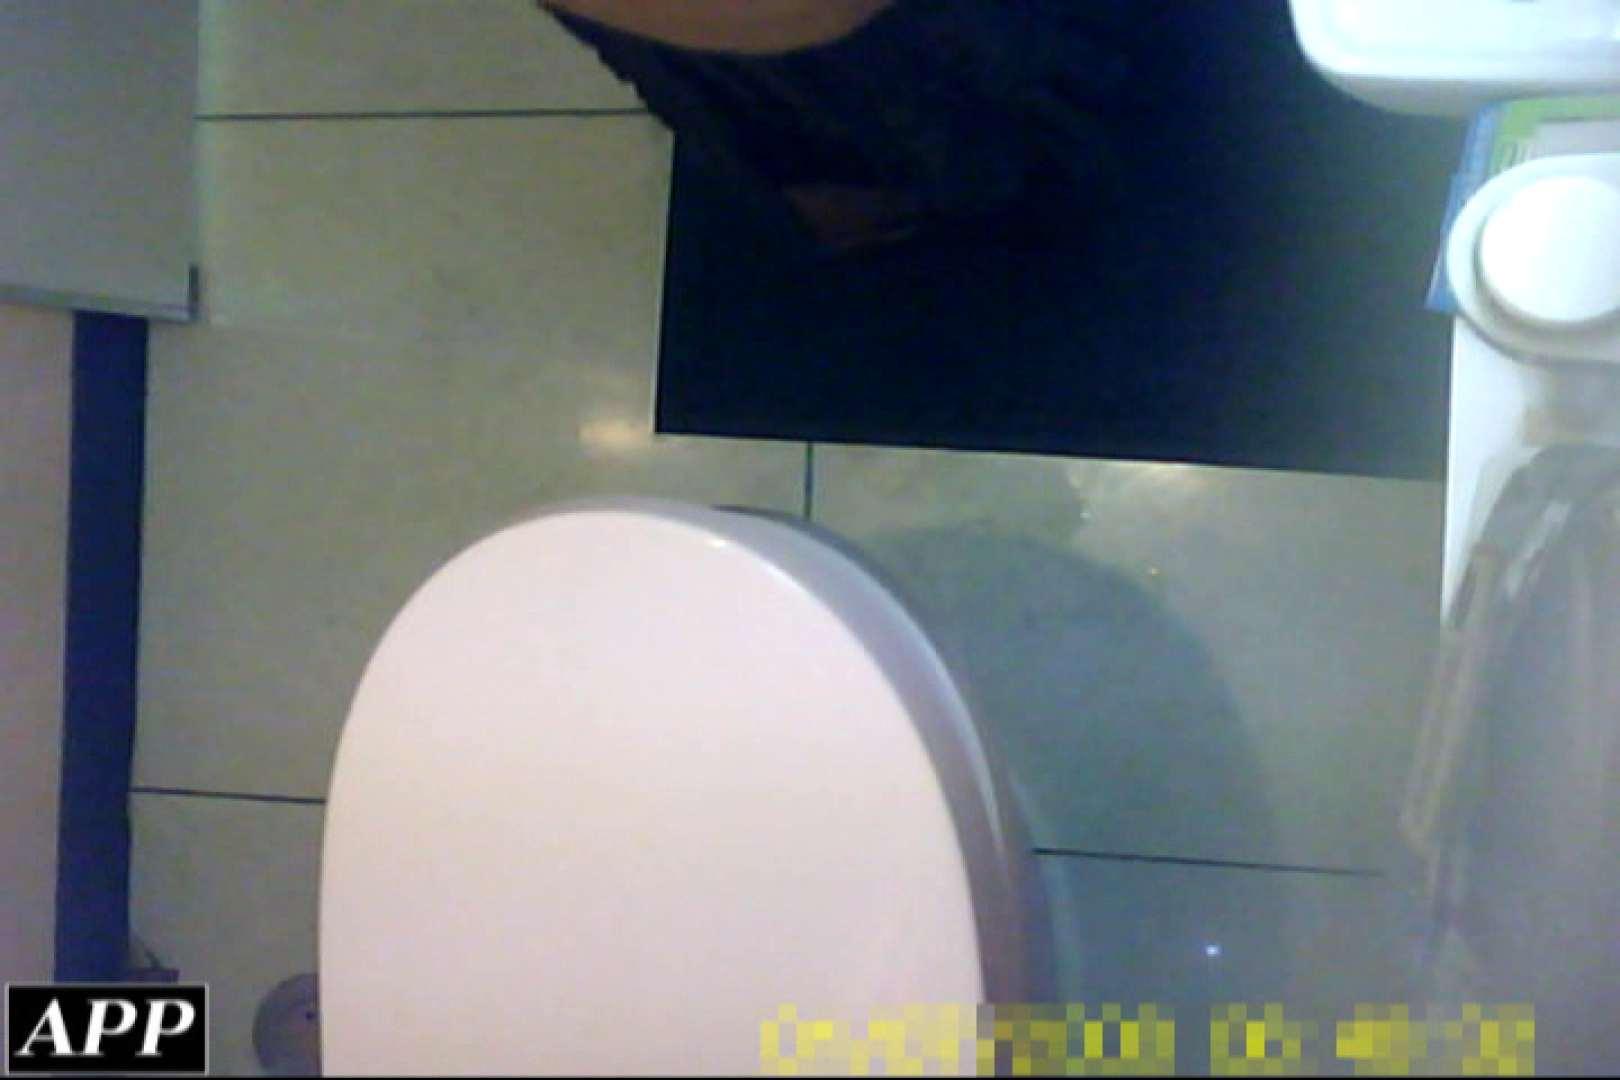 3視点洗面所 vol.78 OLエロ画像  57PICs 12